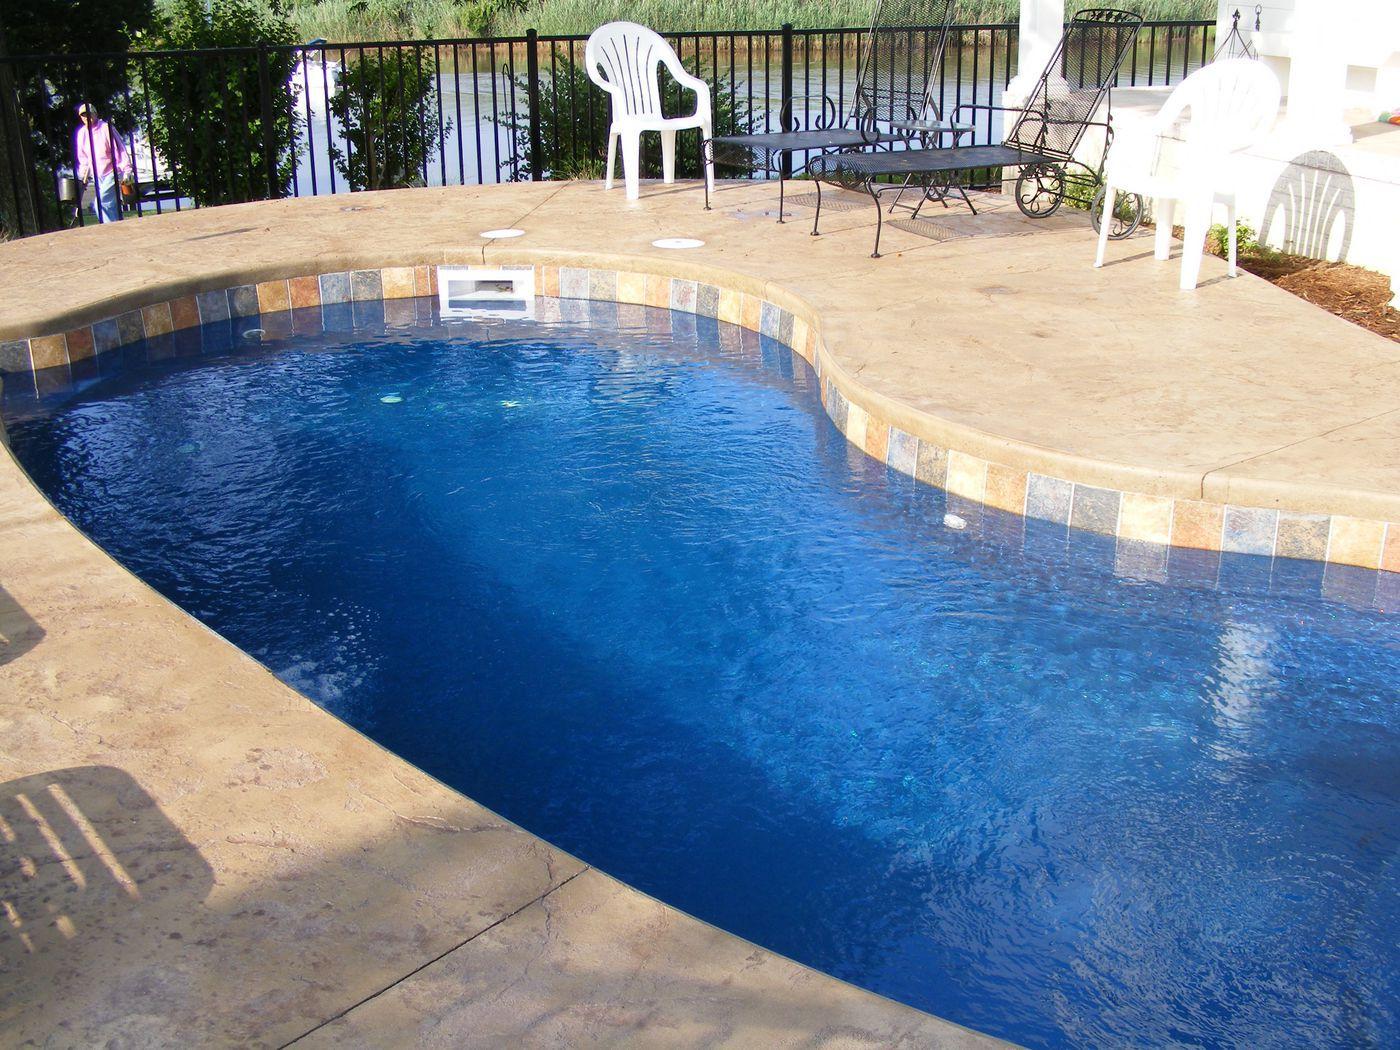 Fiberglass Pool Coping: Paver vs Cantilevered Concrete- Quick Comparison